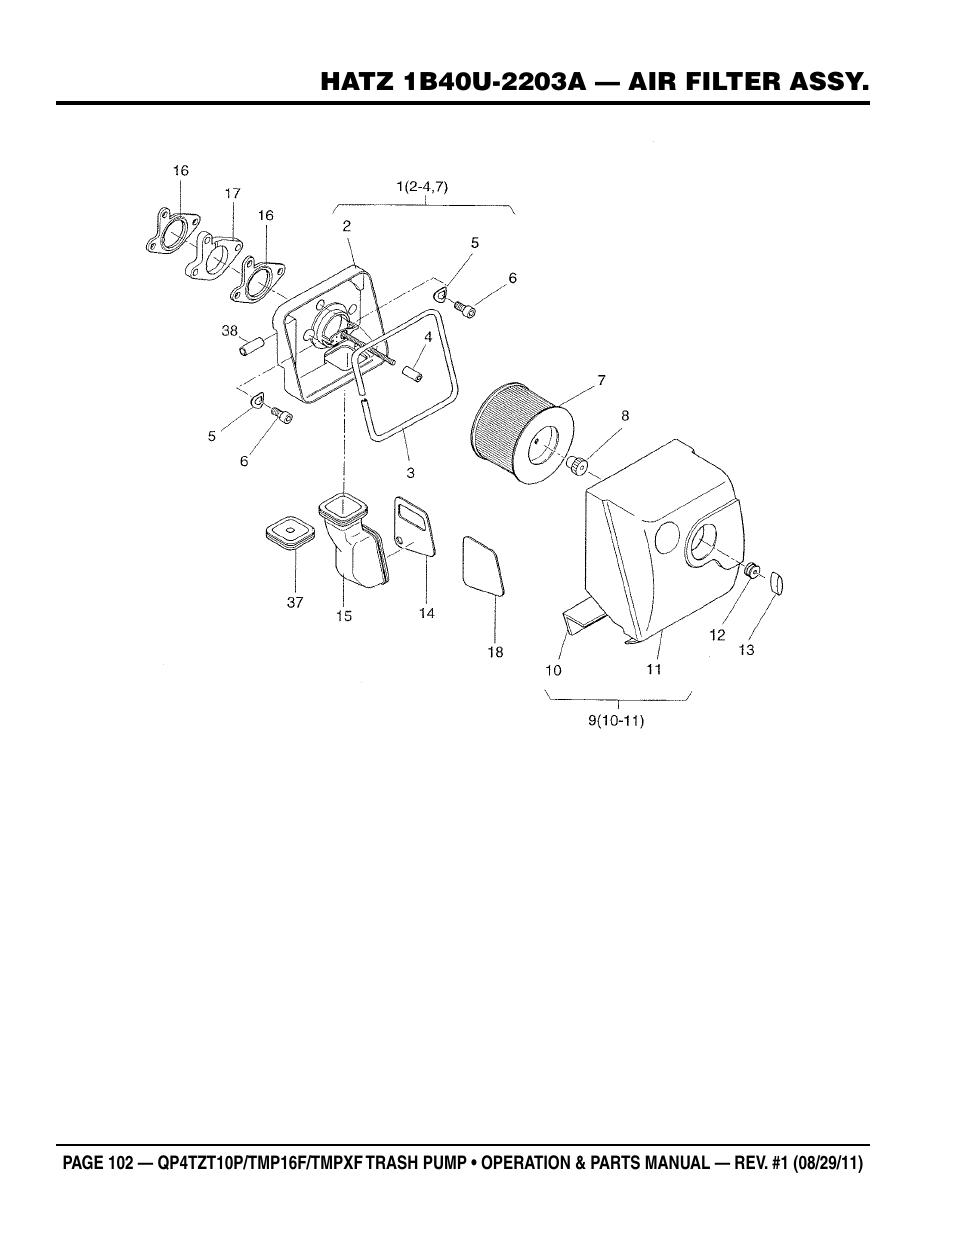 Multiquip Trash Pump Hatz 1b40u 2203a Diesel Engine Qp4tzt10p User Diagram Manual Page 102 118 Also For